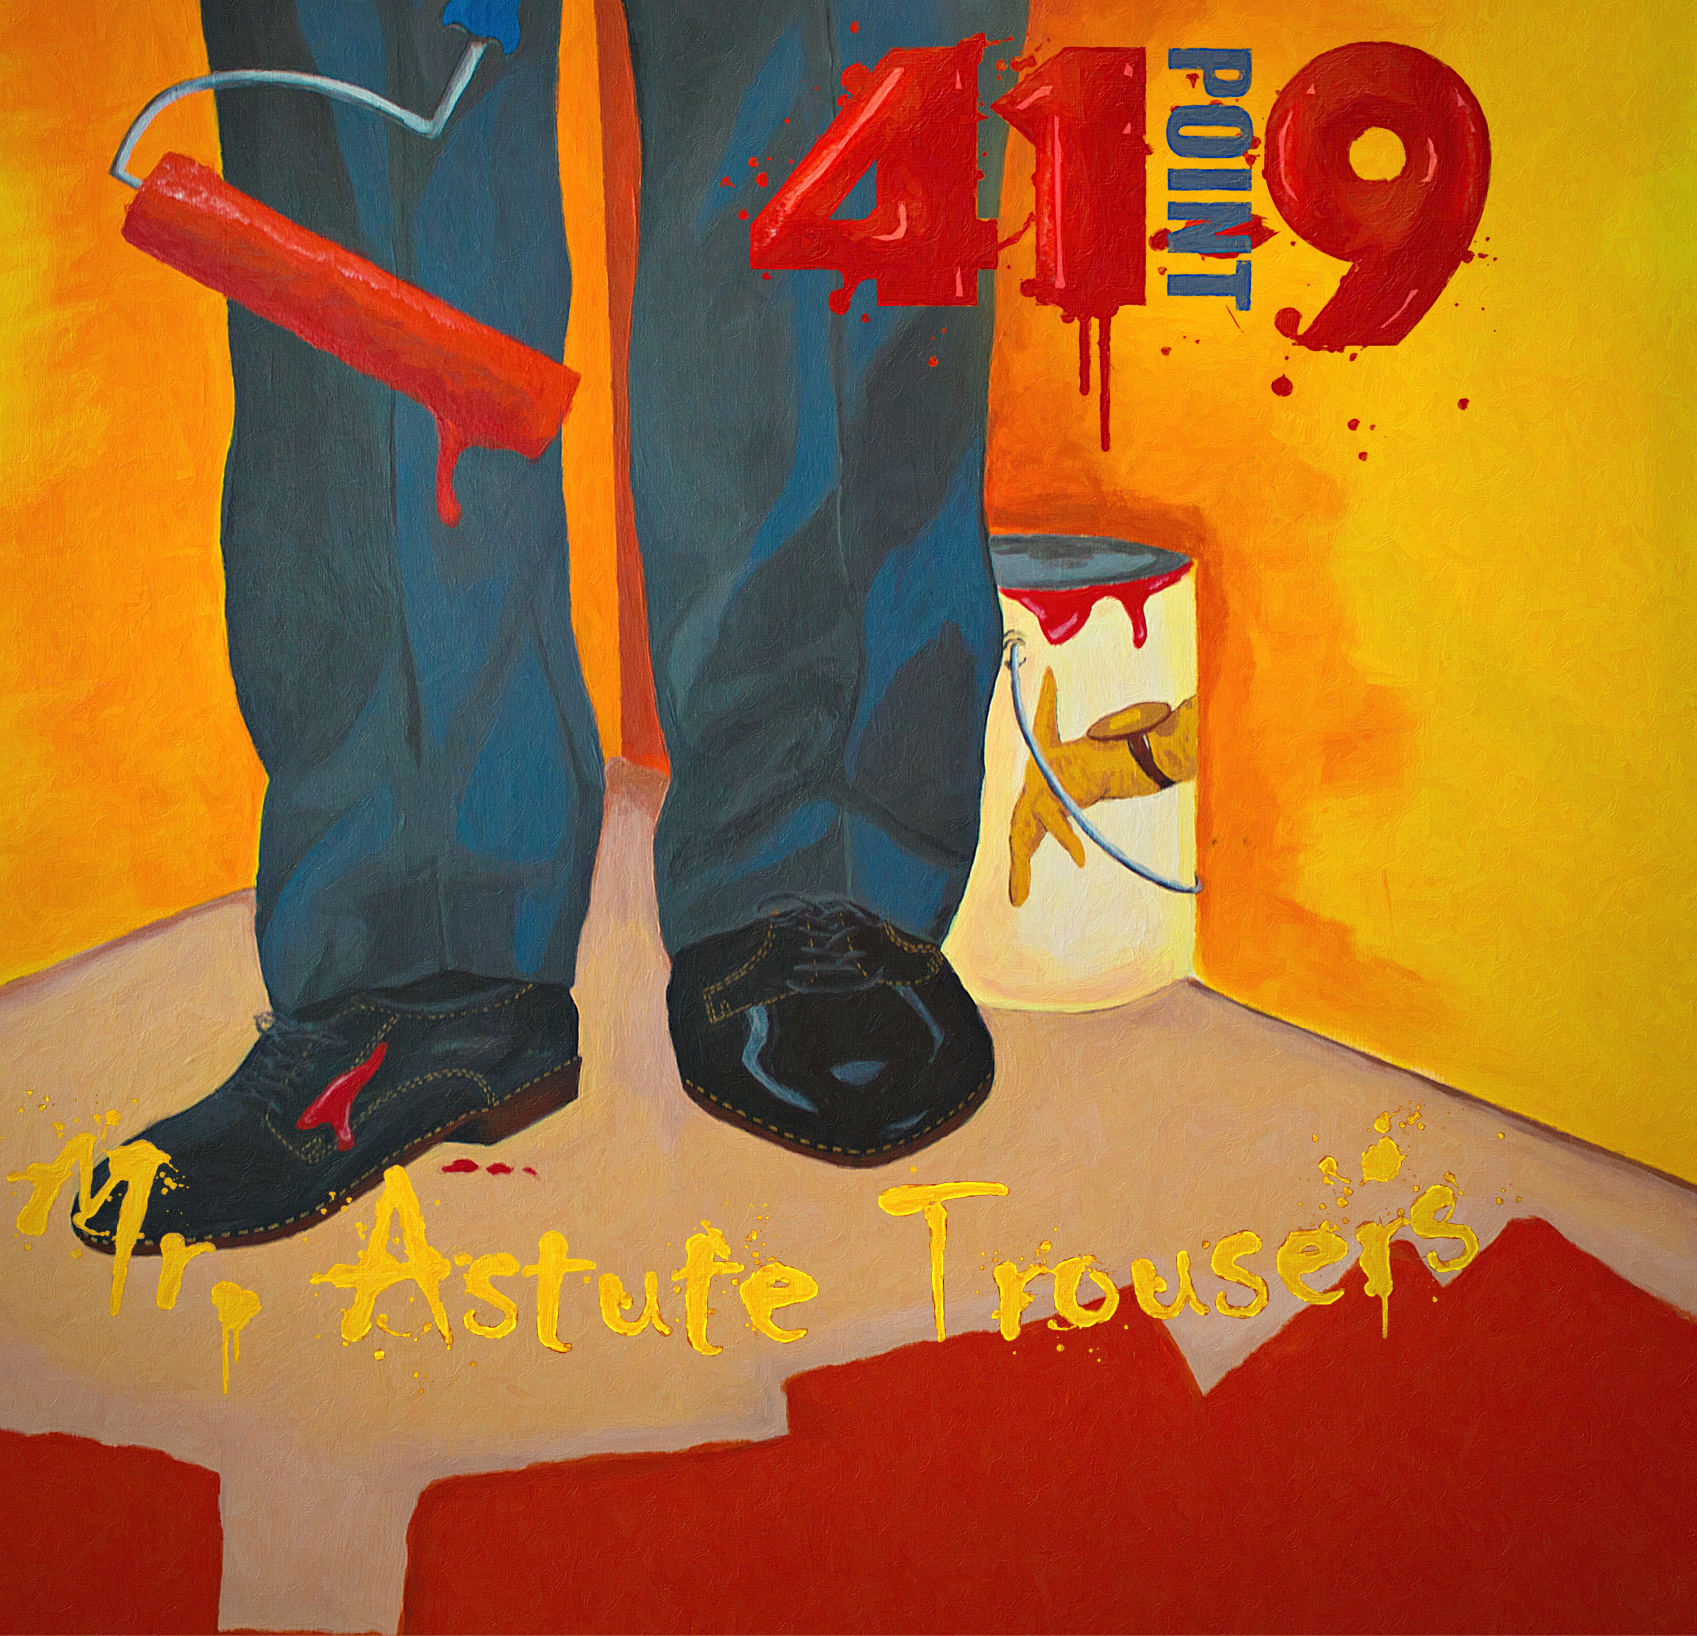 Mr Astute Trousers Album Cover.png